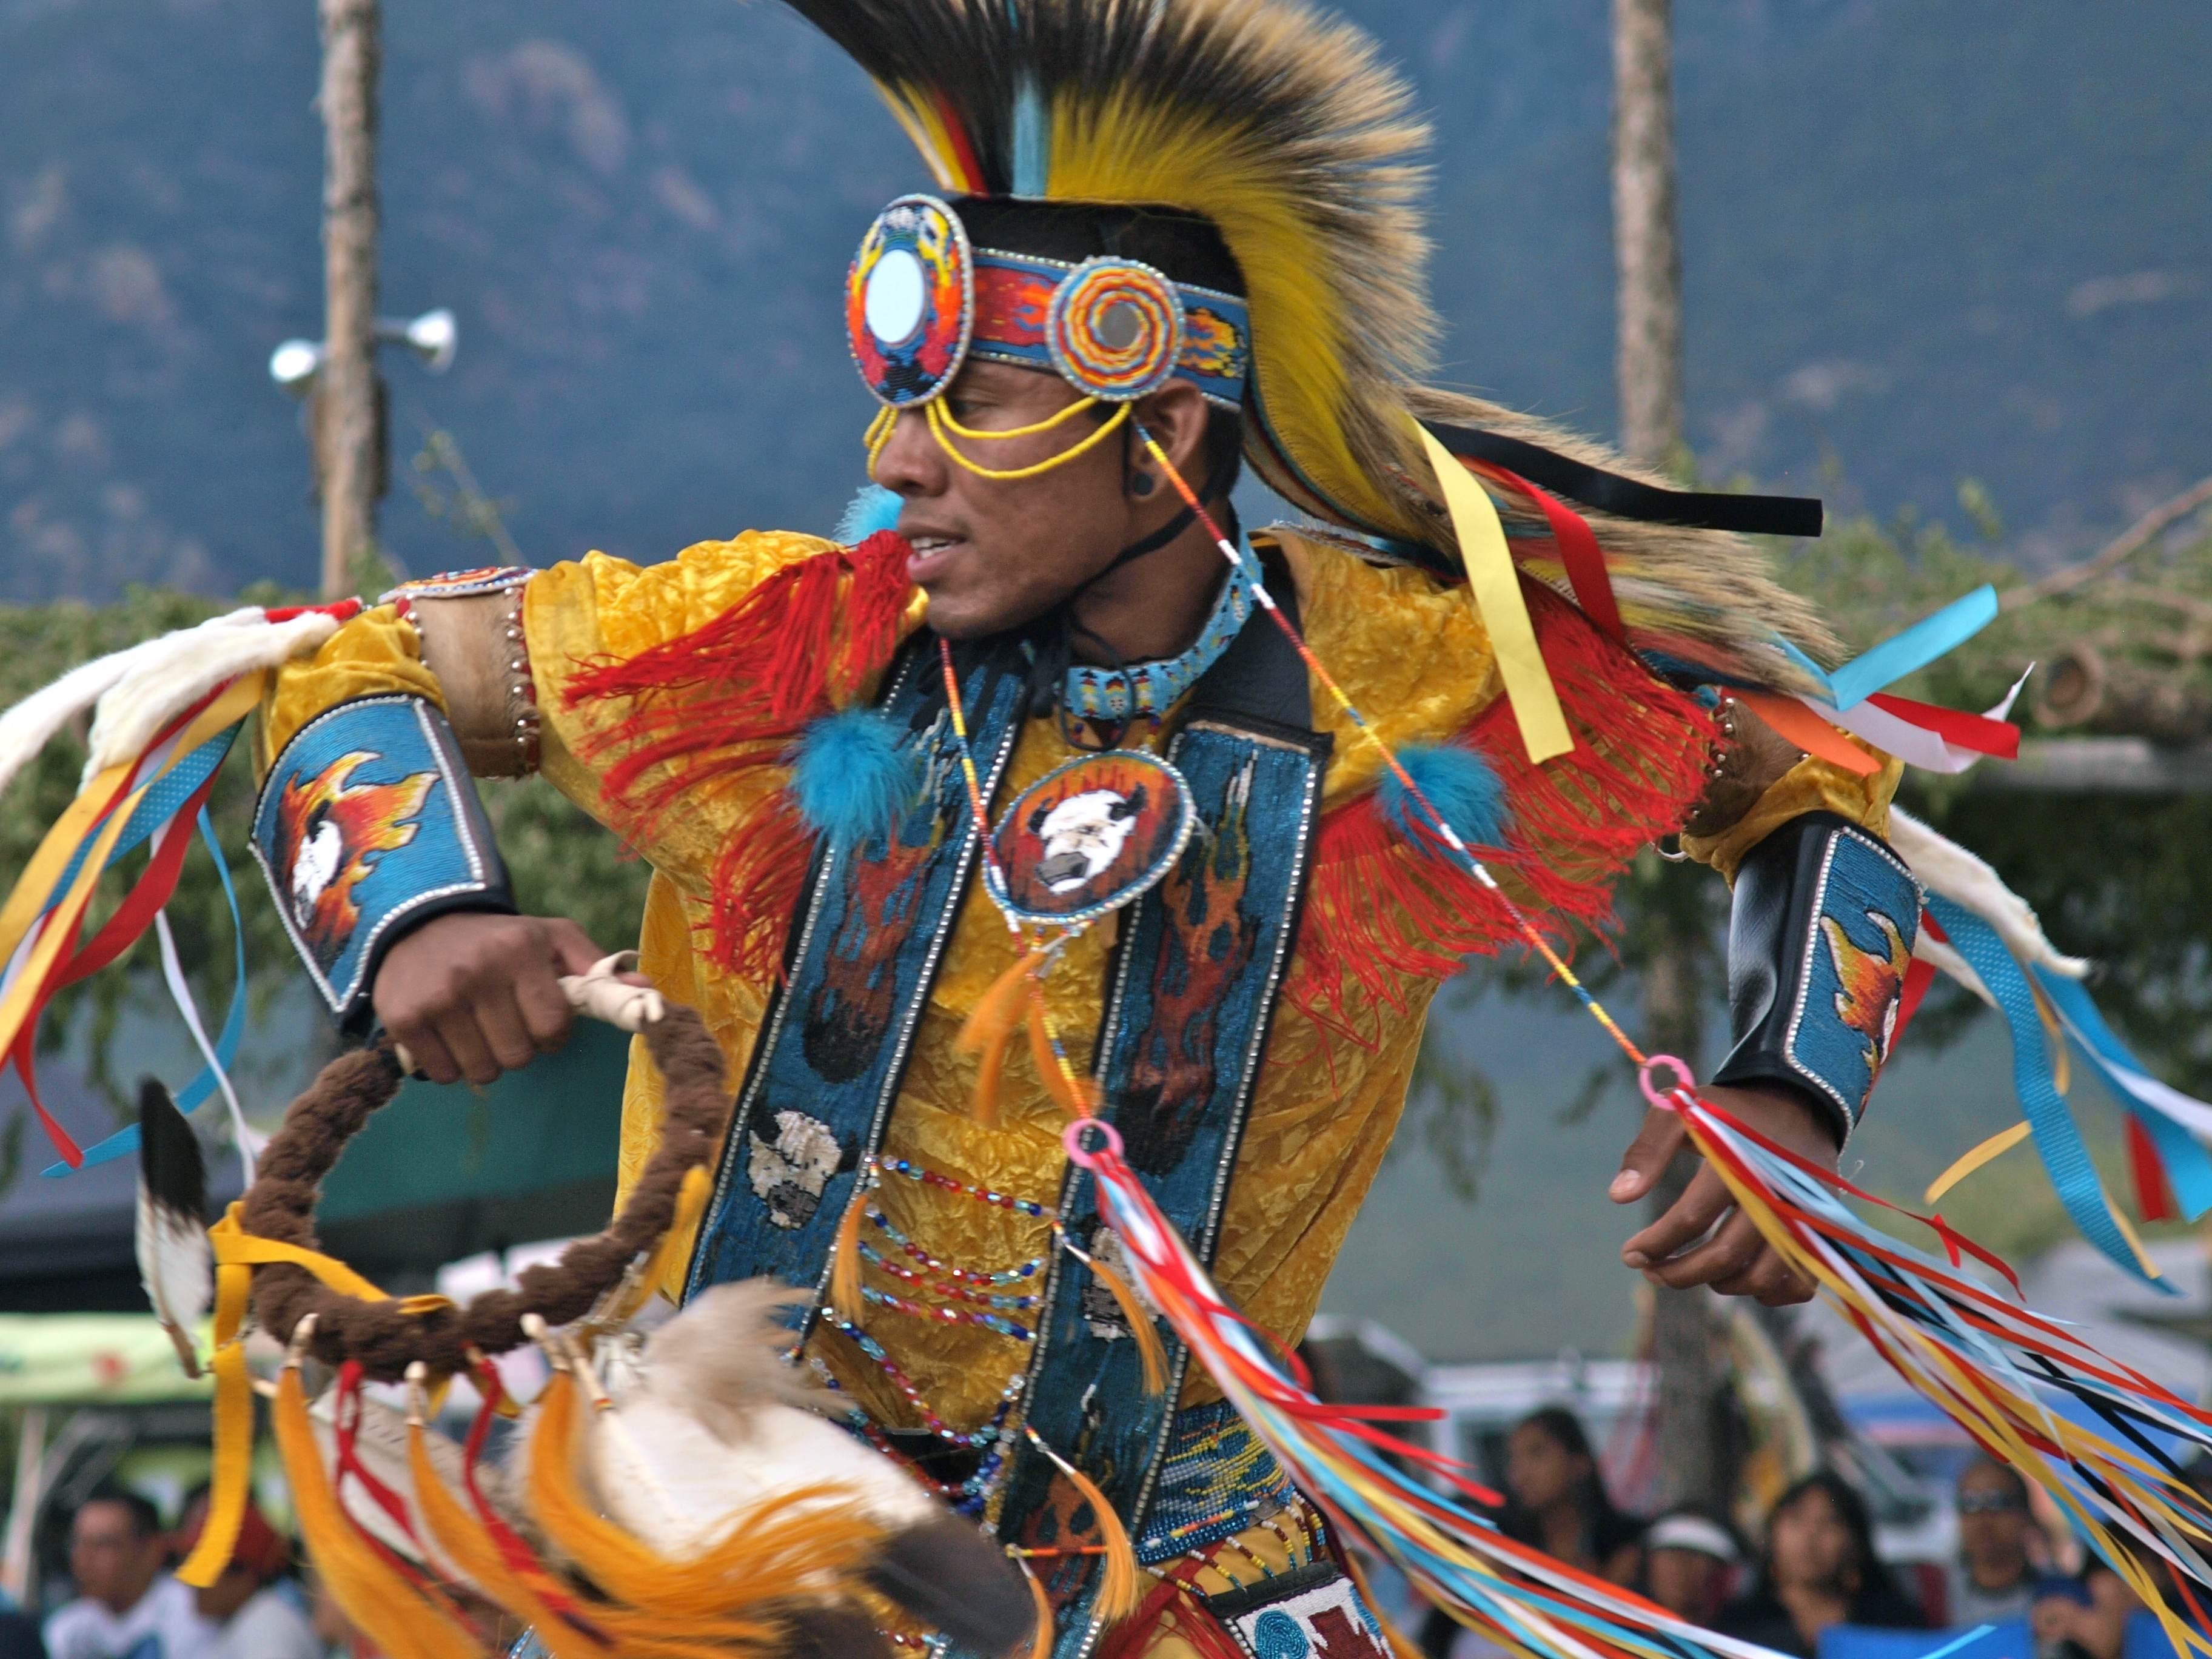 Grass Dancer Taos Pueblo Powwow, NM (2011)